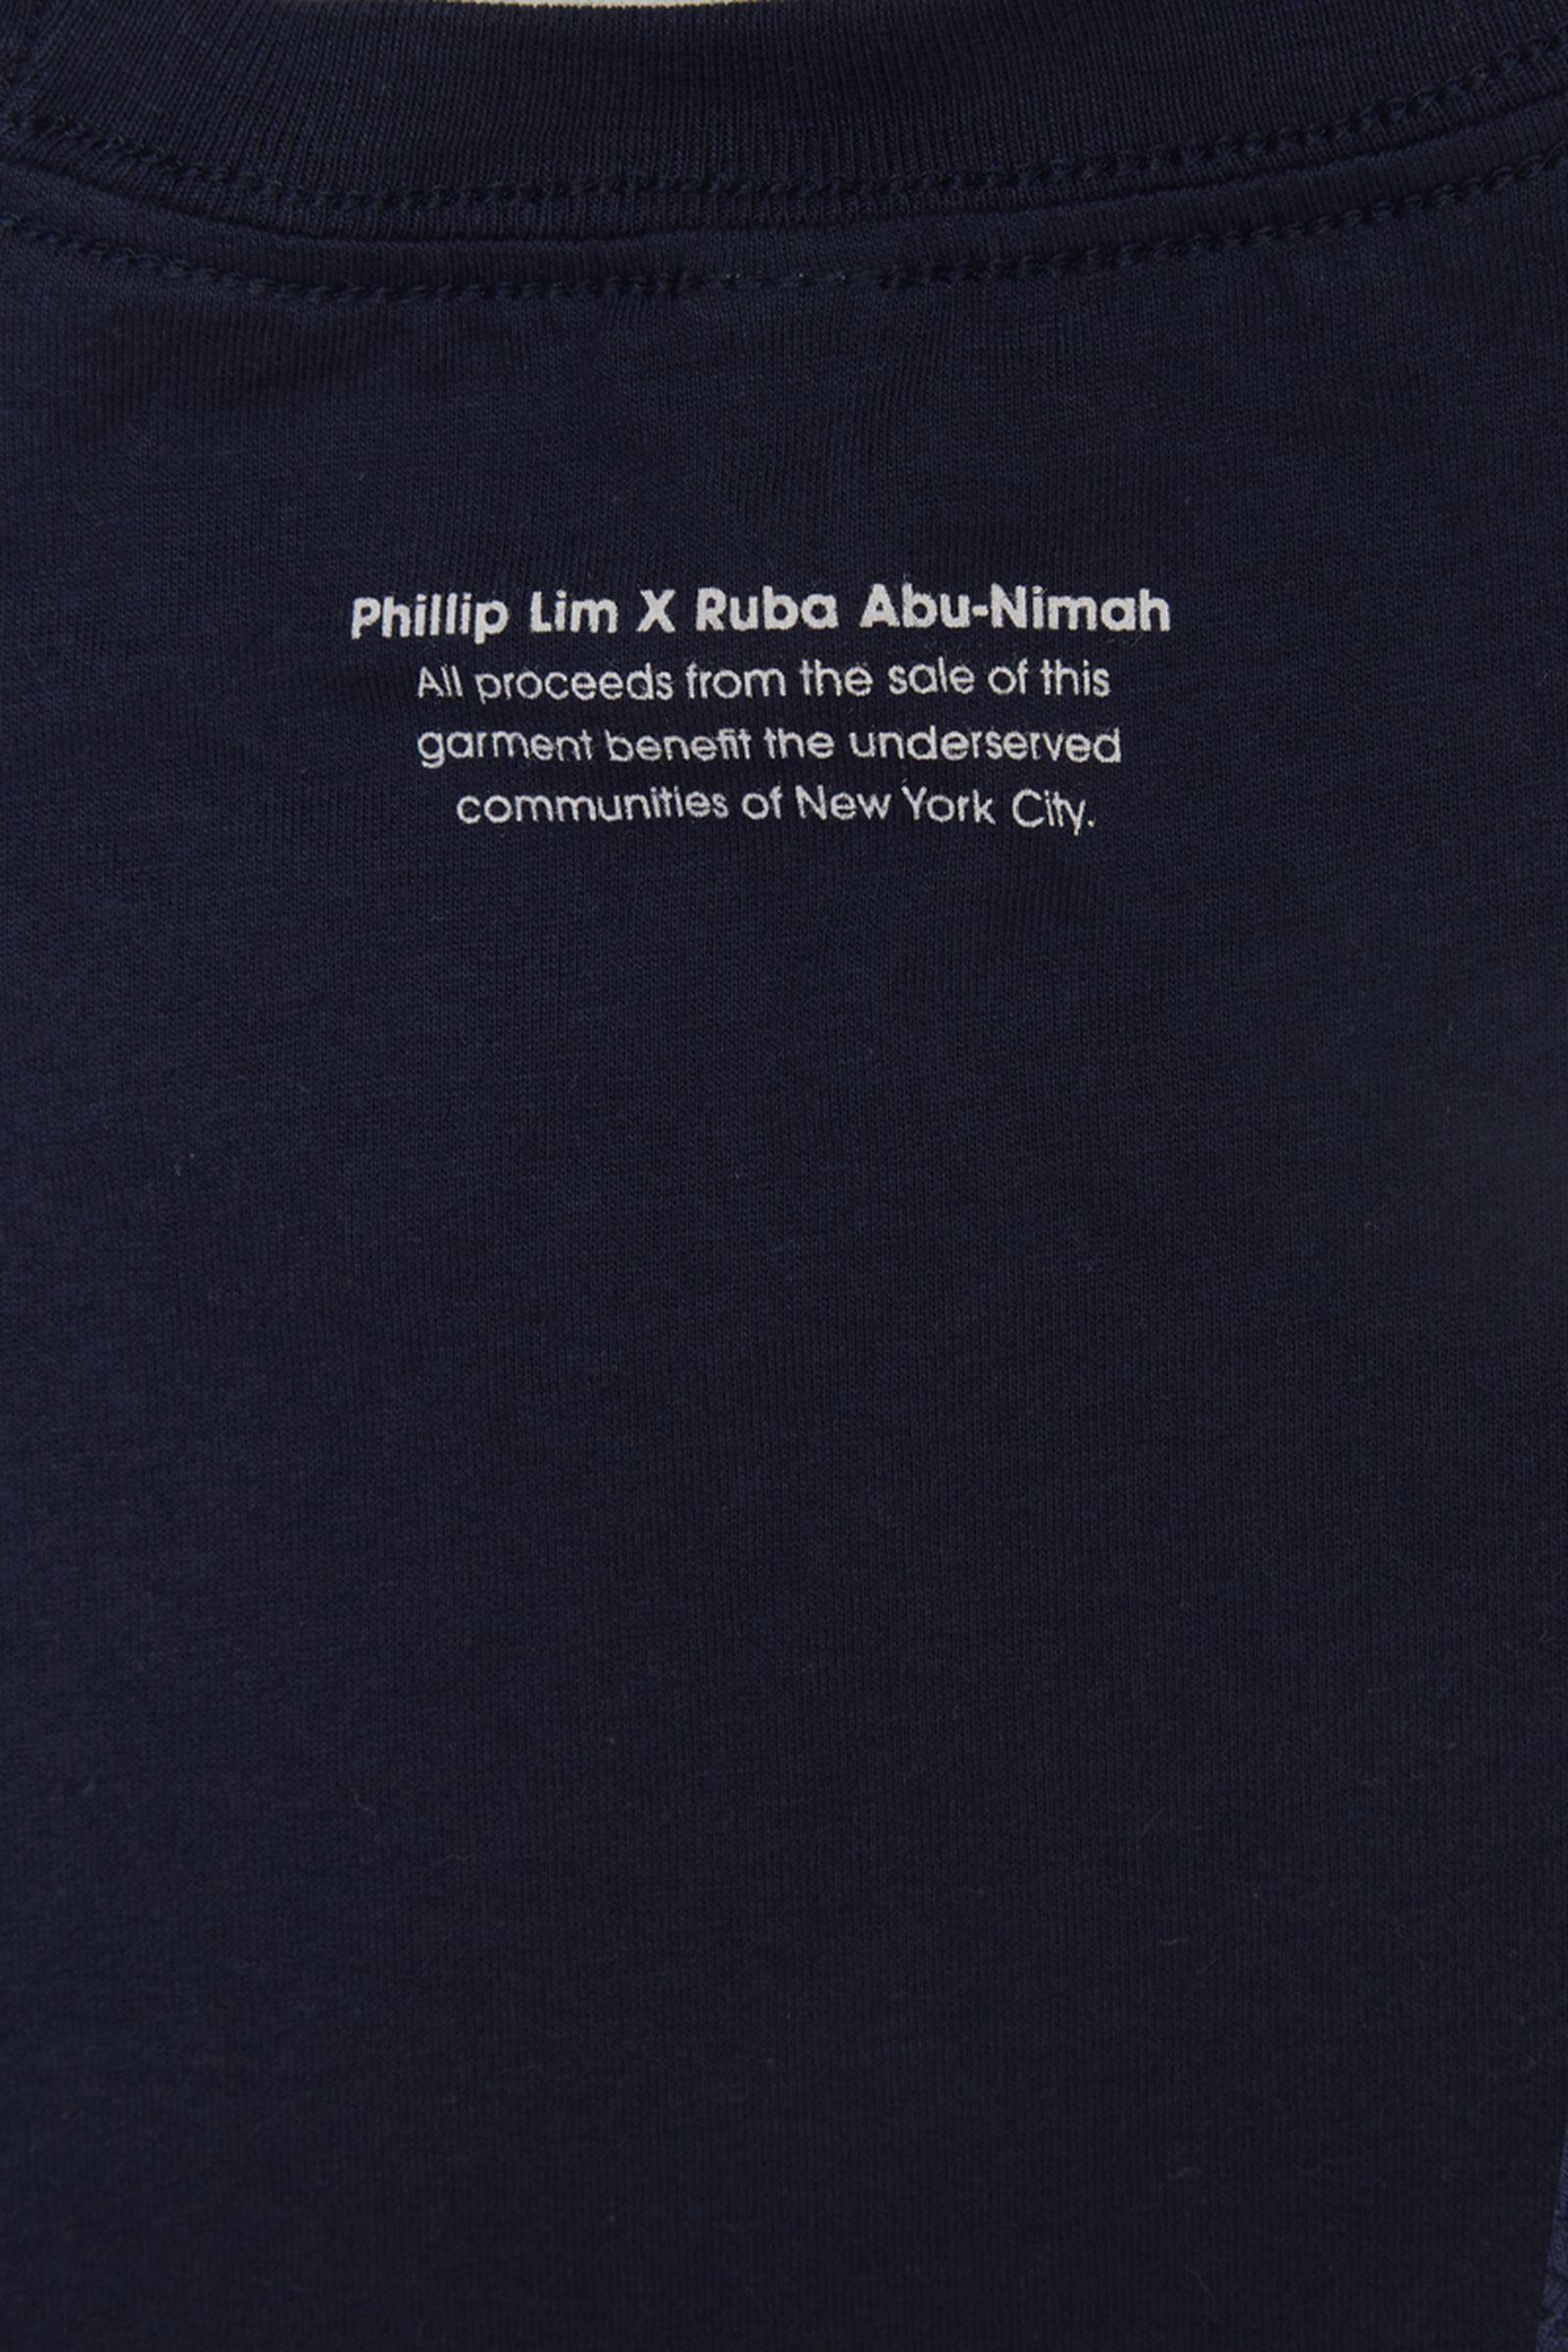 ruba-phillip-lim-tee-05